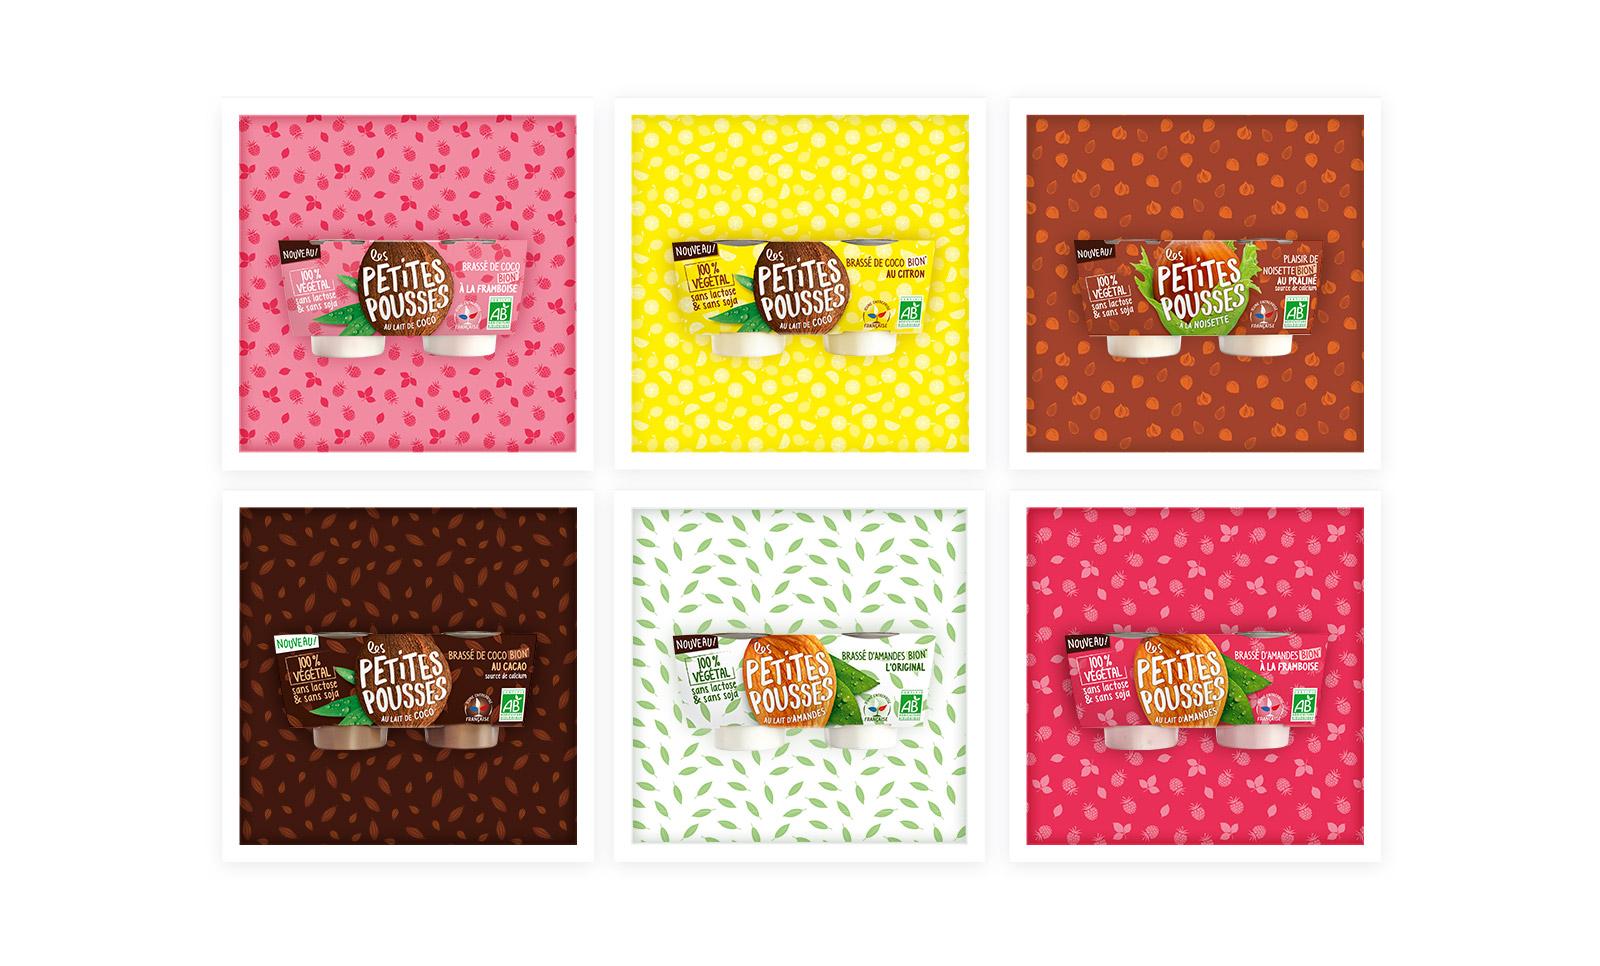 Design_gamme_packaging_Les_petites_pousses_agence_Register